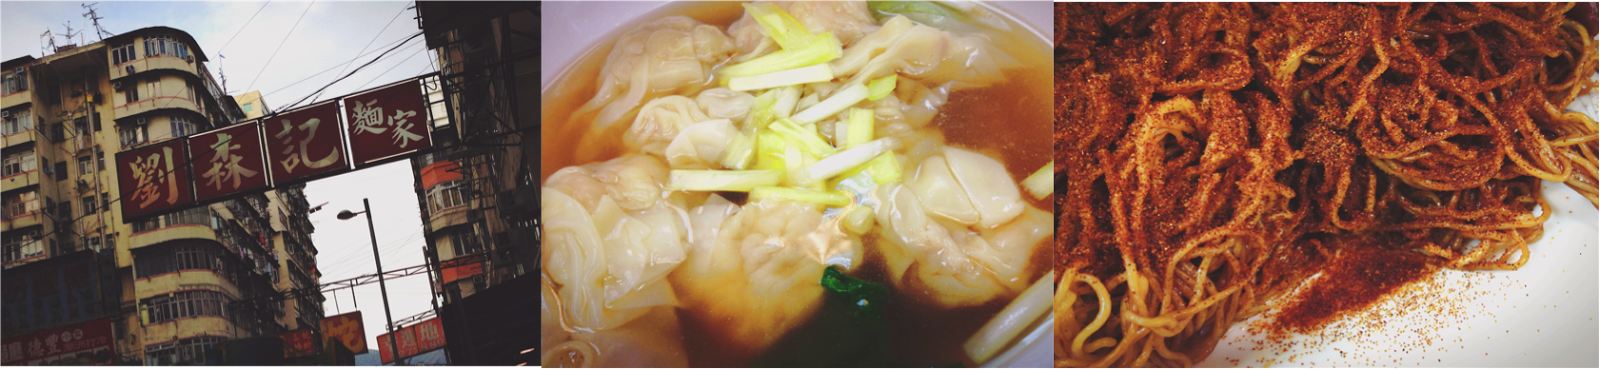 Lau Sum Kee Noodles Sham Shui Po Hong Kong